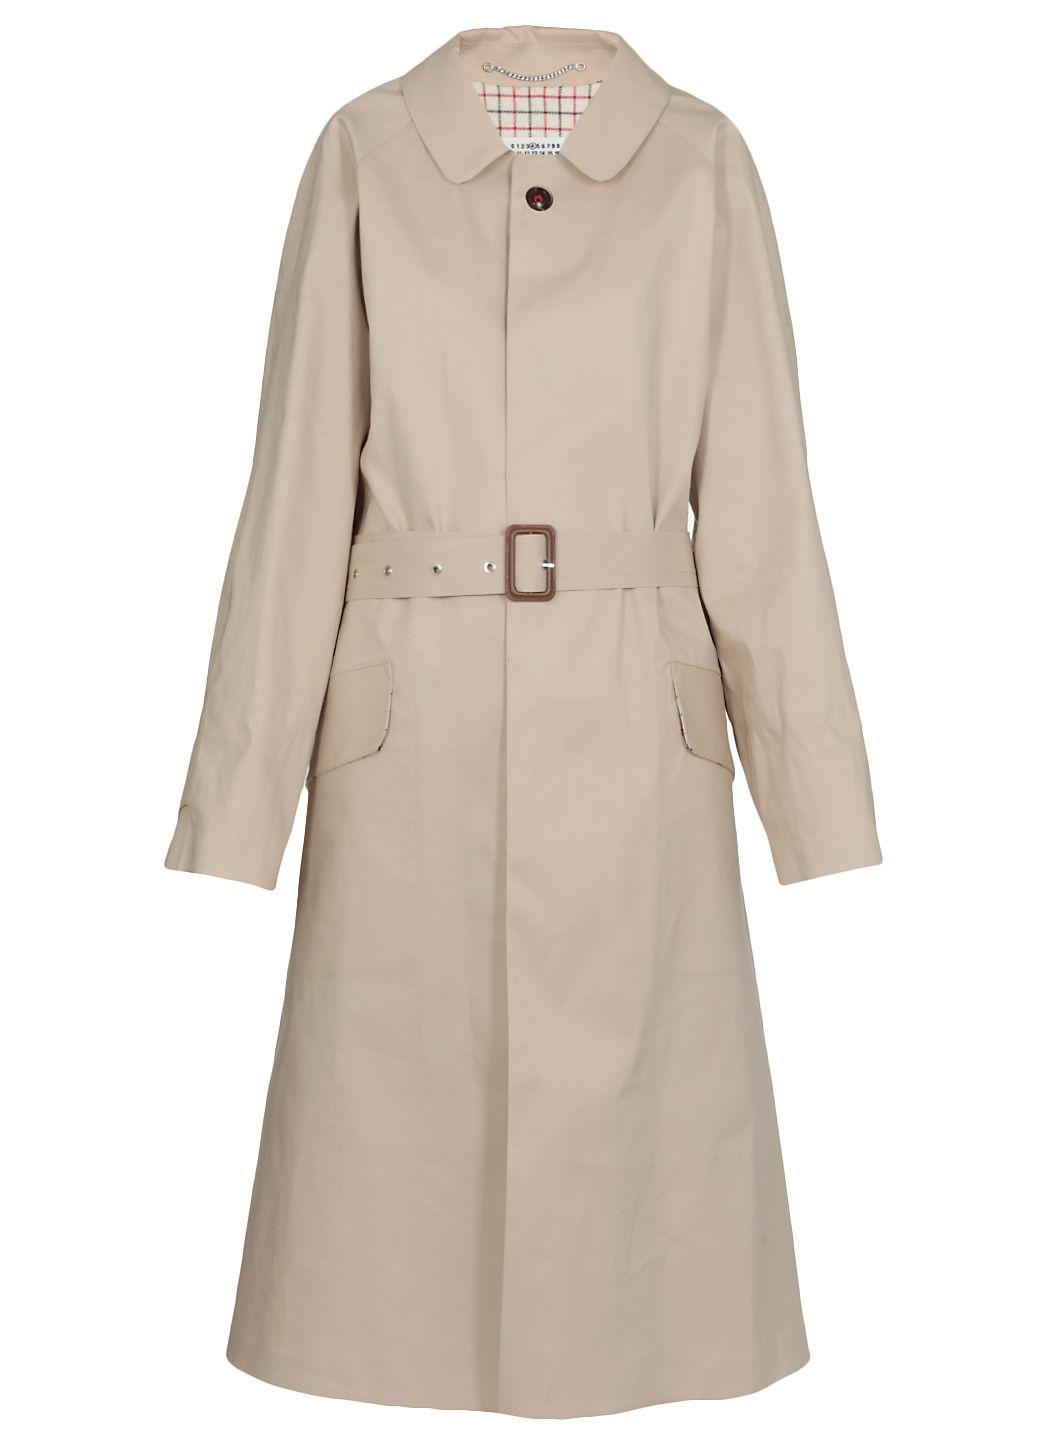 Mackintosh cotton trench coat